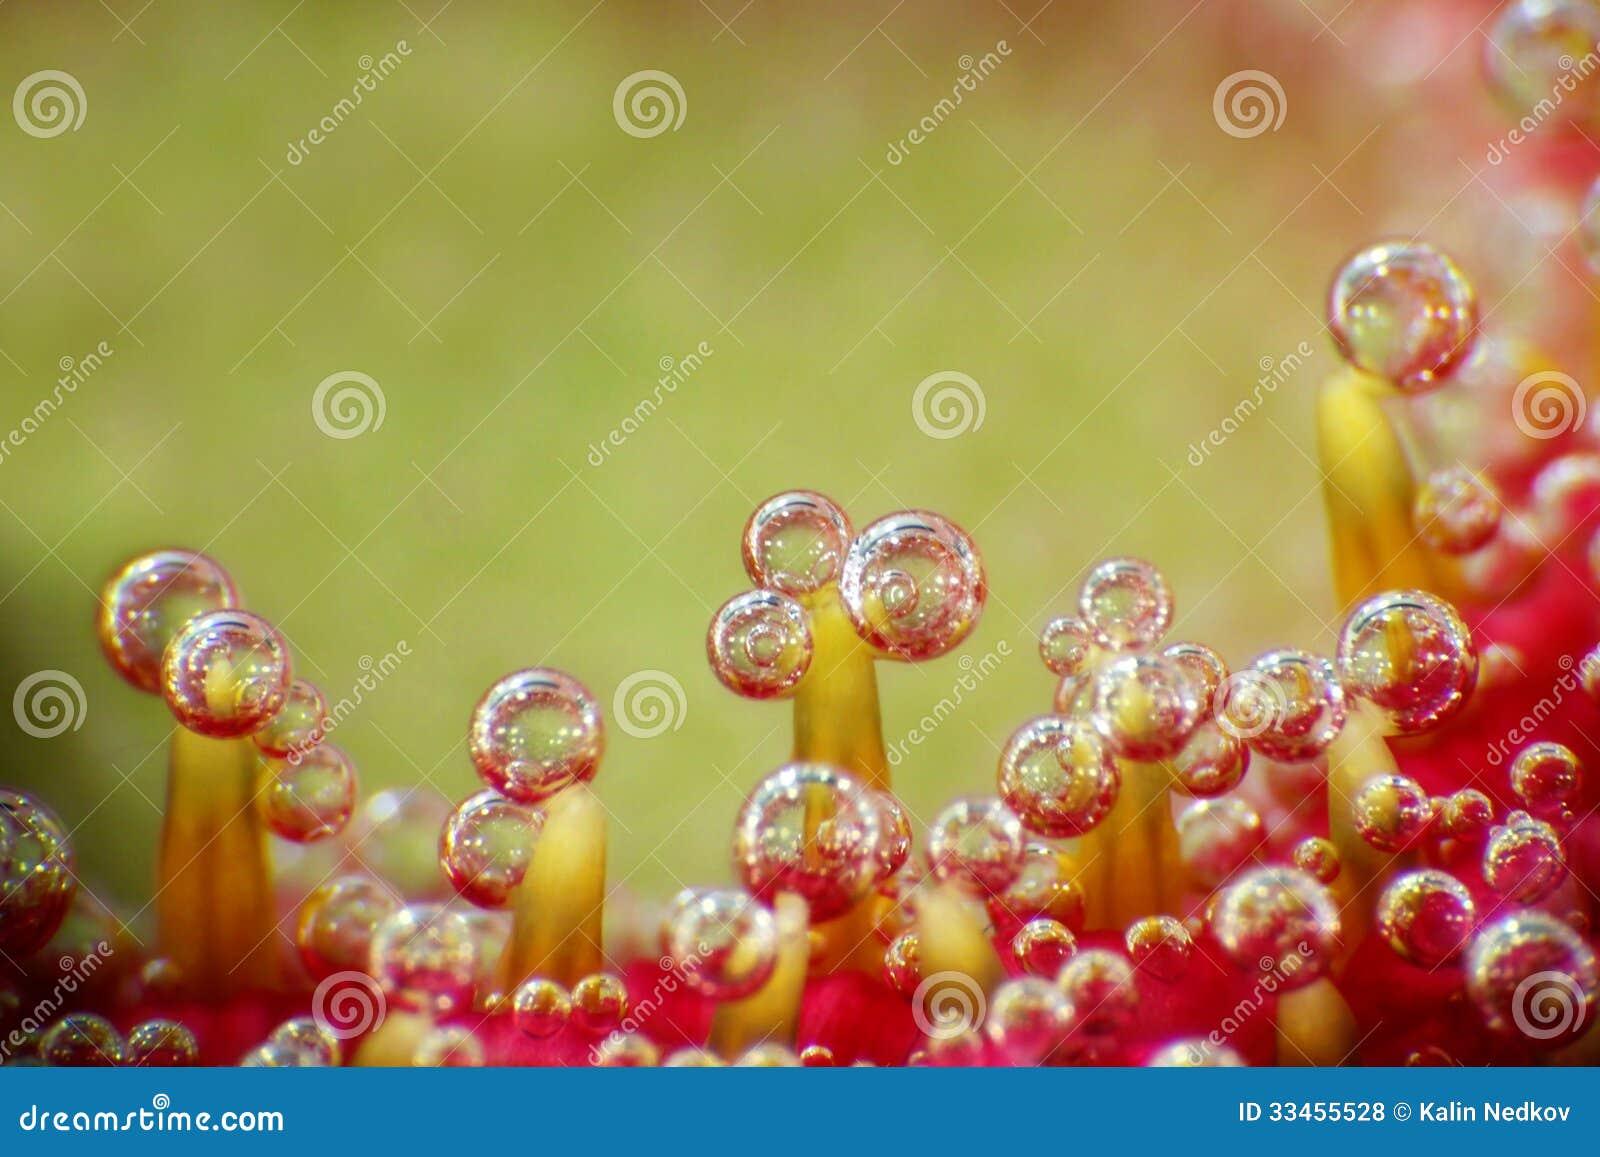 Bubbles on a flower